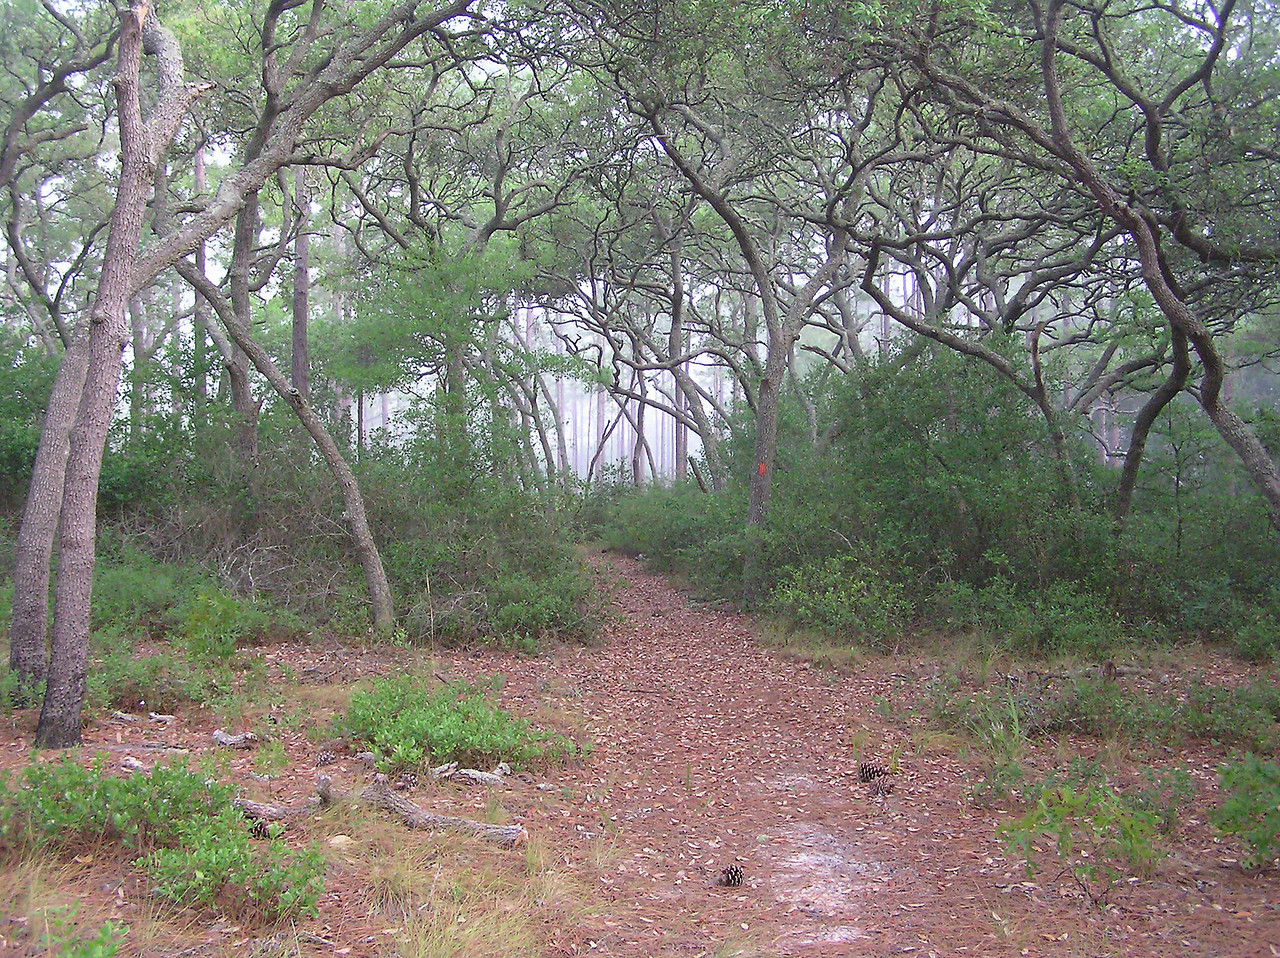 Hiking in the Ocala<br /> photo credit: Jack Hailman / Florida Trail Association